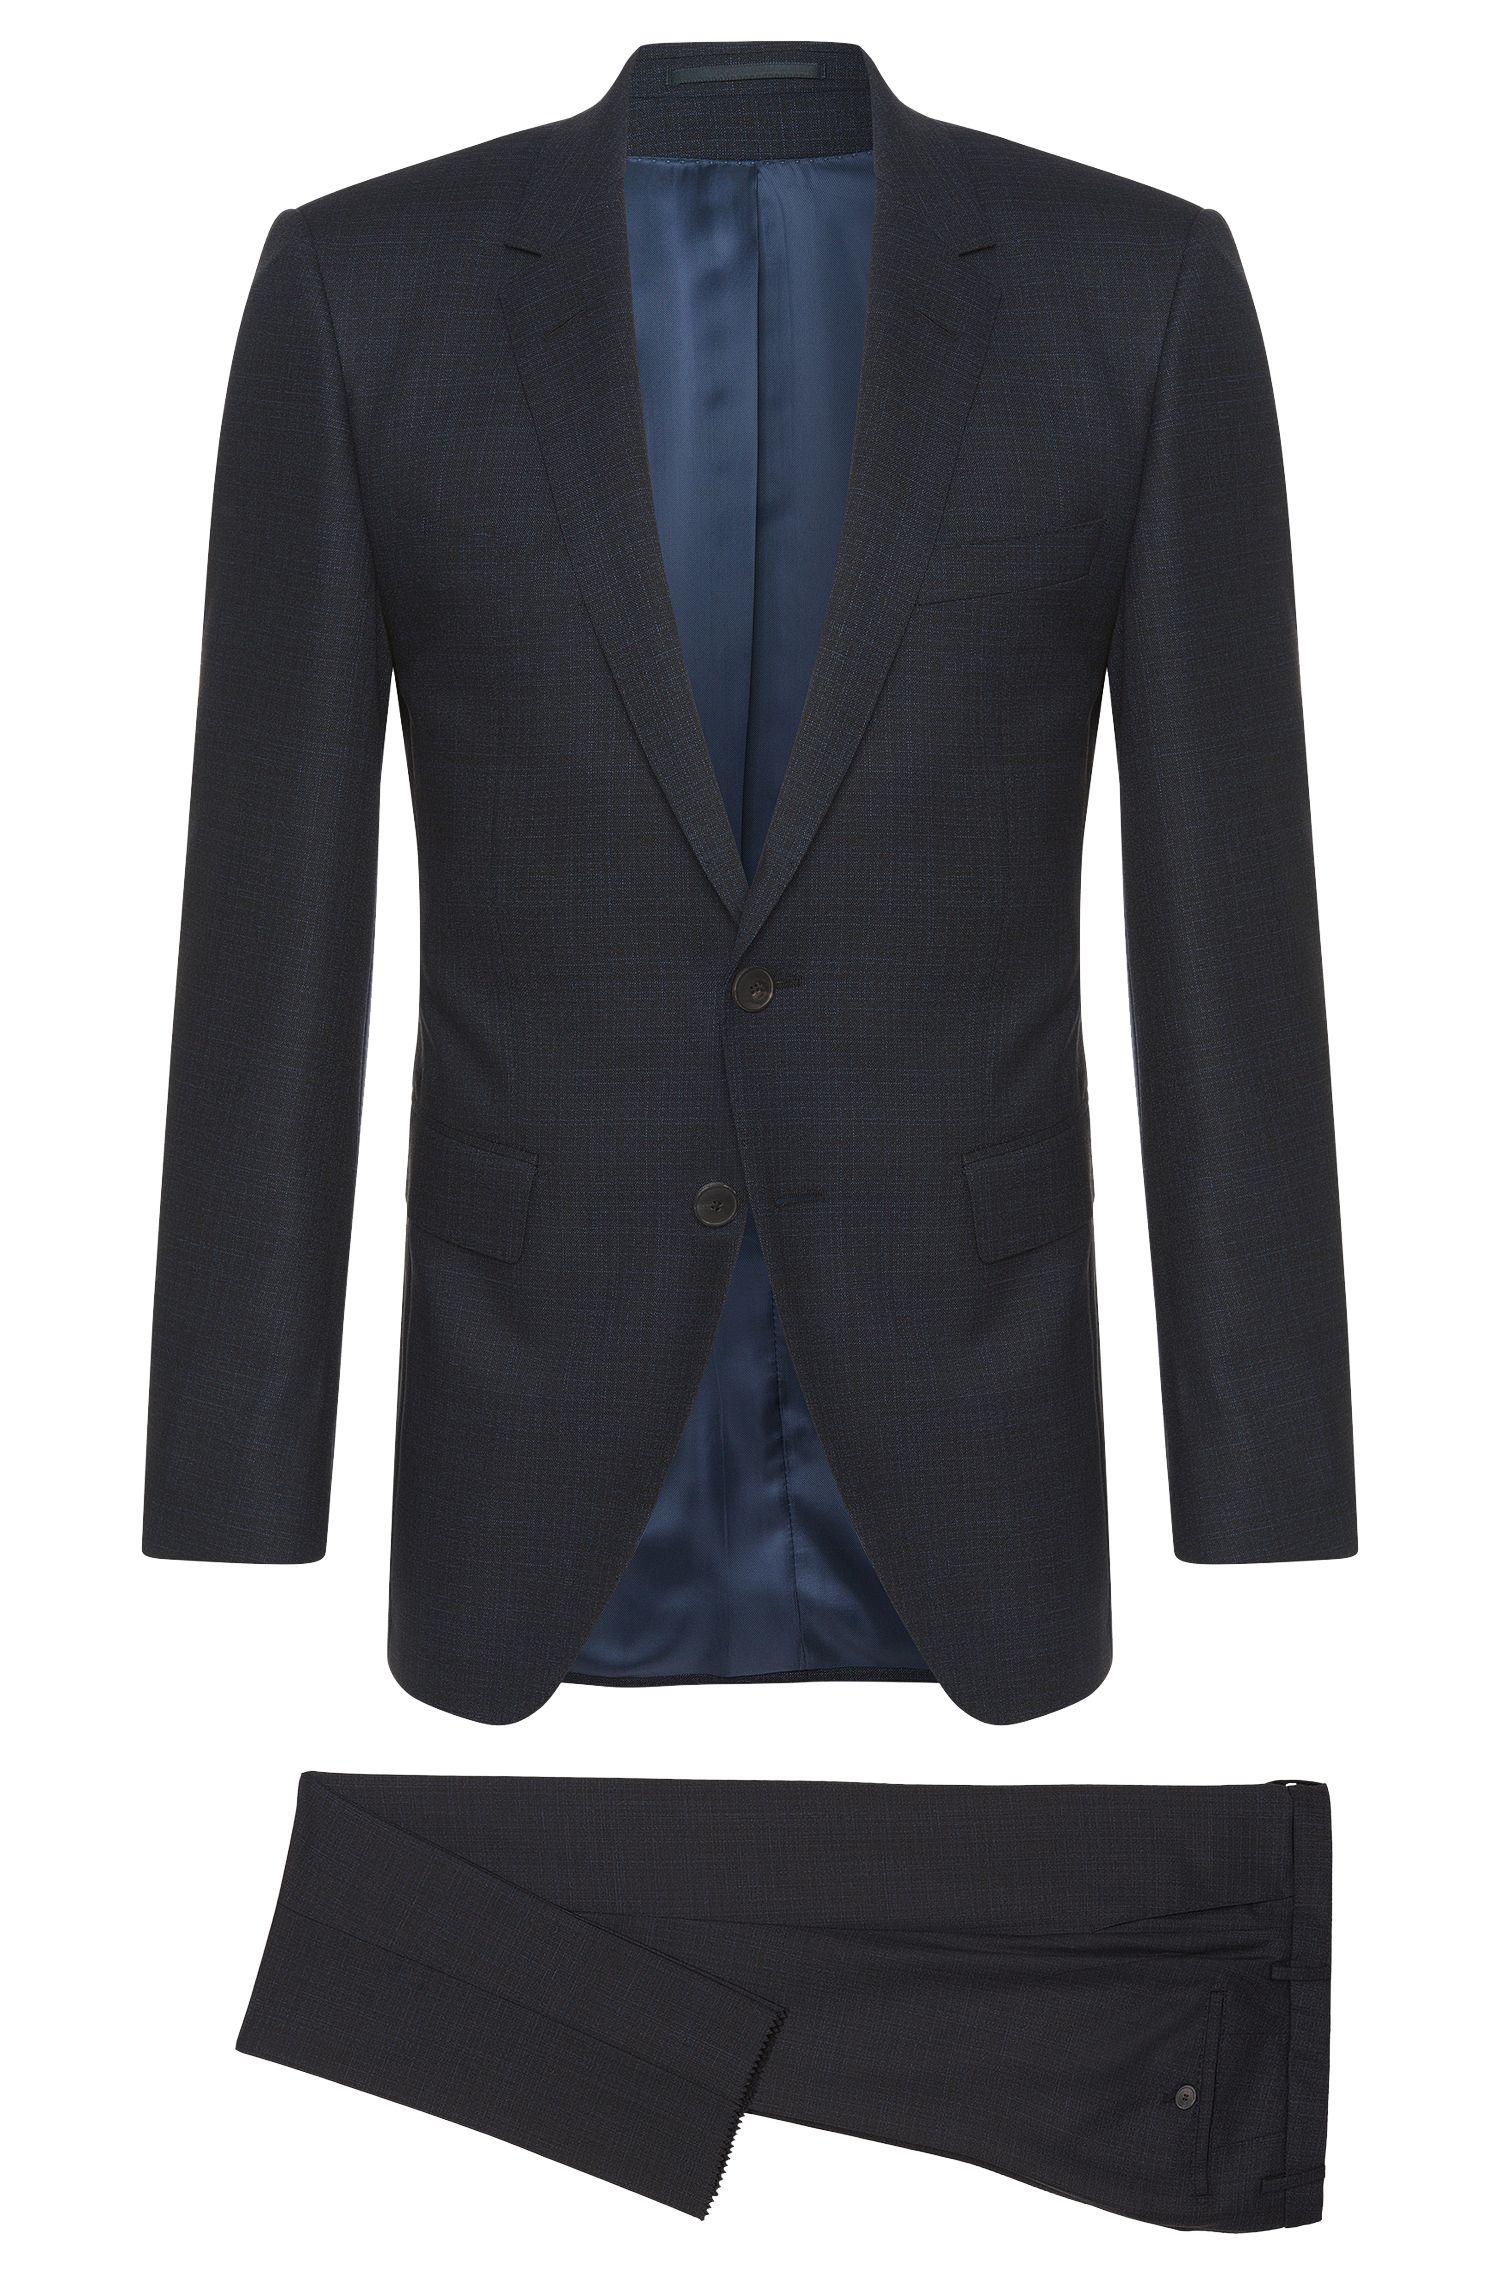 Crosshatch Super 150 Italian Wool Suit, Extra-Slim Fit | T-Reeve/Wain